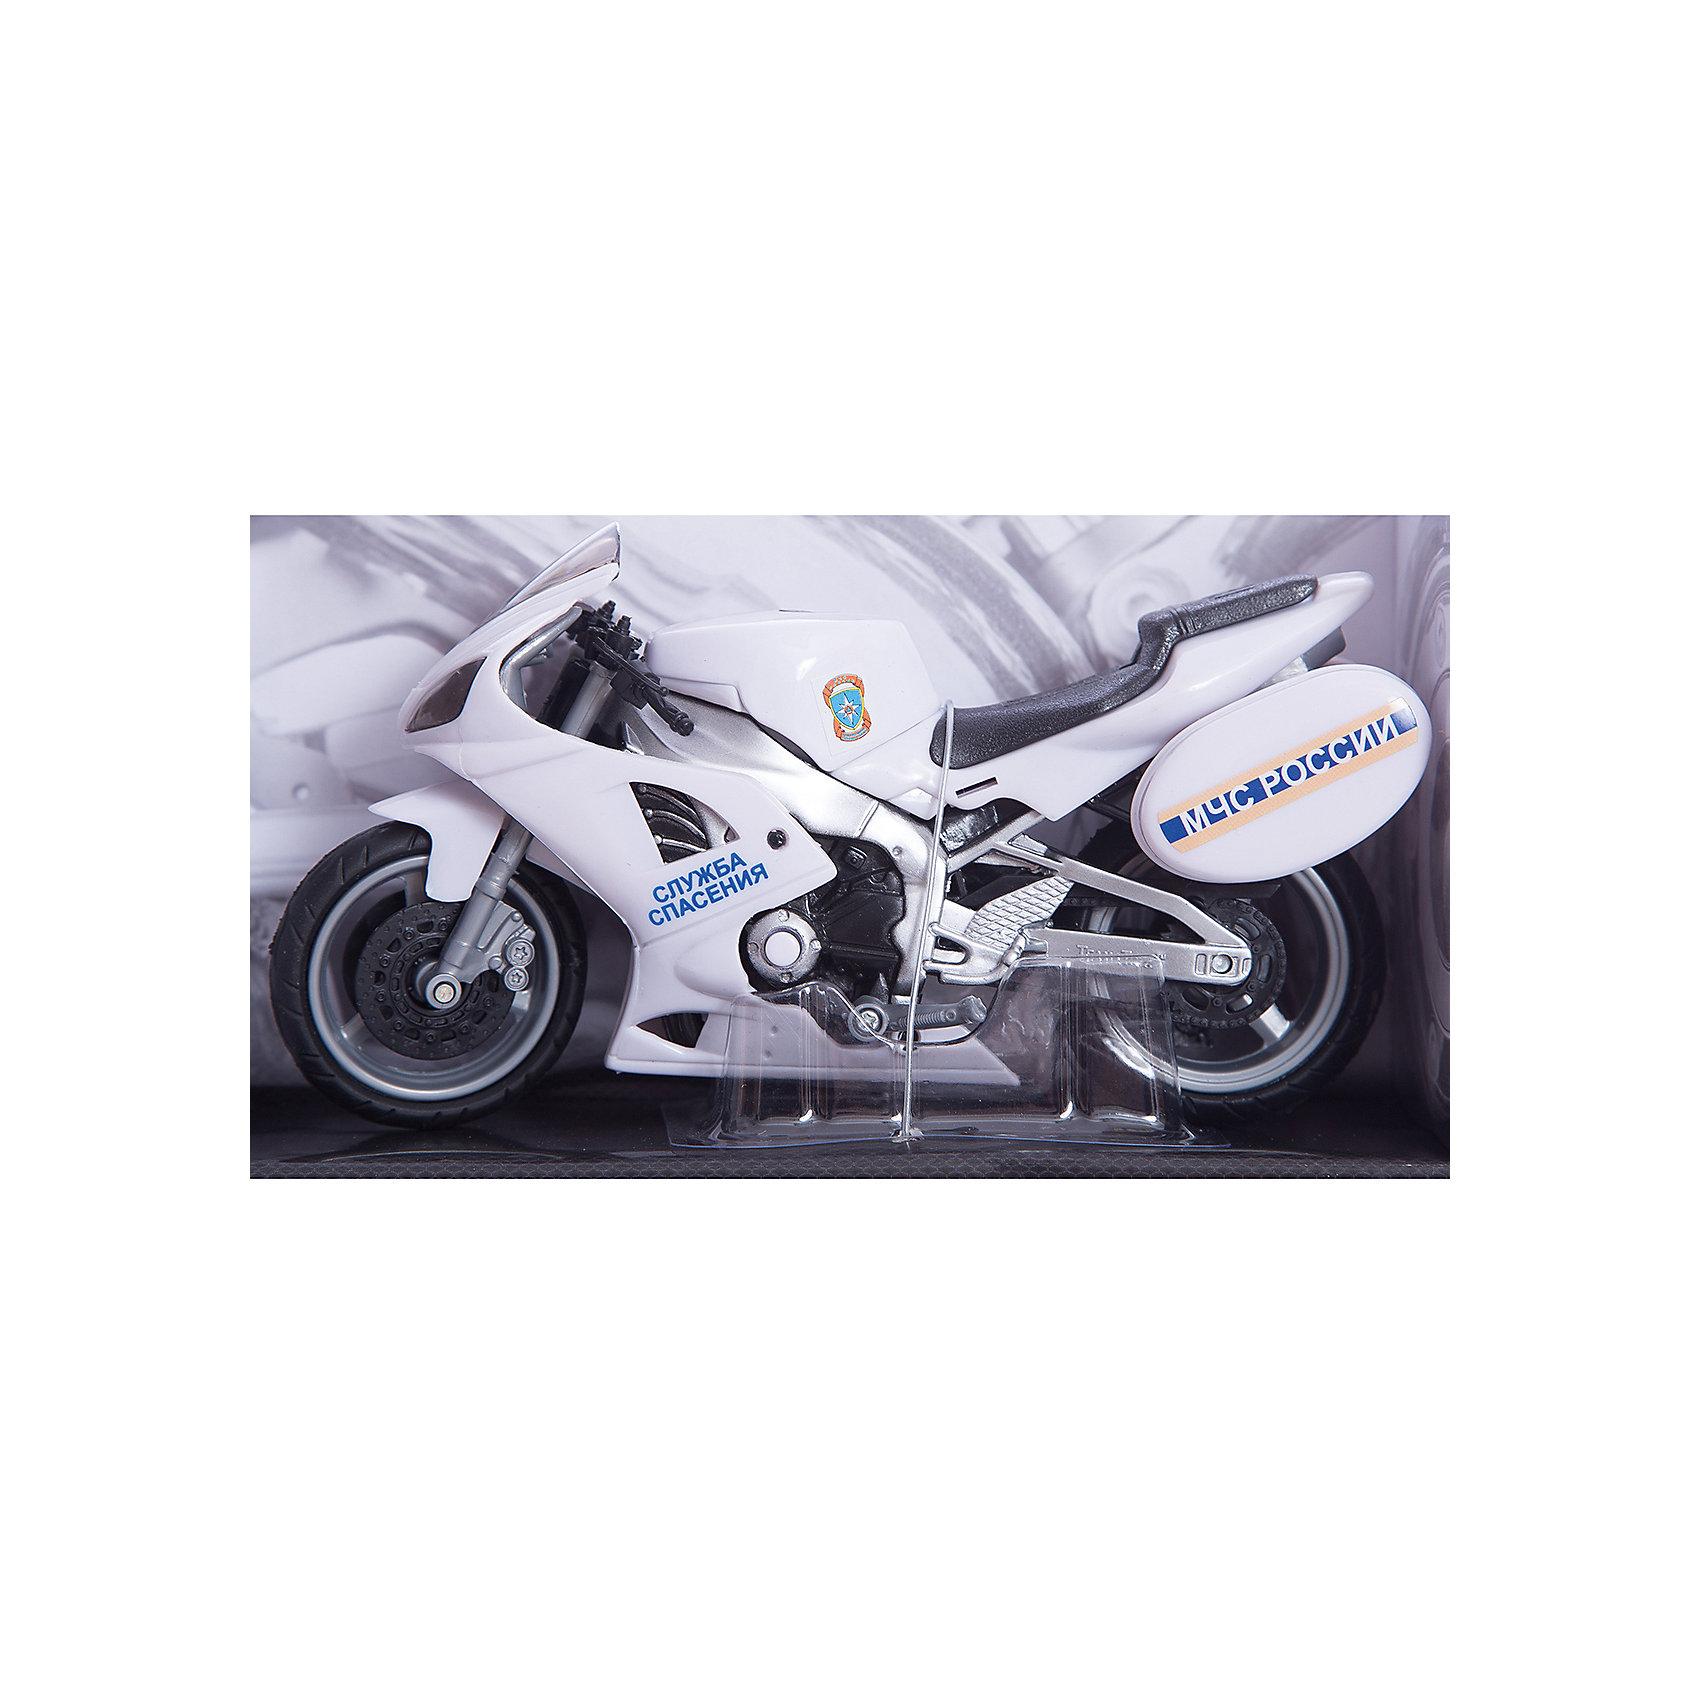 Мотоцикл Emergency Bike МЧС, звук 1:12, AutotimeМашинки<br><br><br>Ширина мм: 350<br>Глубина мм: 158<br>Высота мм: 120<br>Вес г: 15<br>Возраст от месяцев: 36<br>Возраст до месяцев: 2147483647<br>Пол: Мужской<br>Возраст: Детский<br>SKU: 5584123